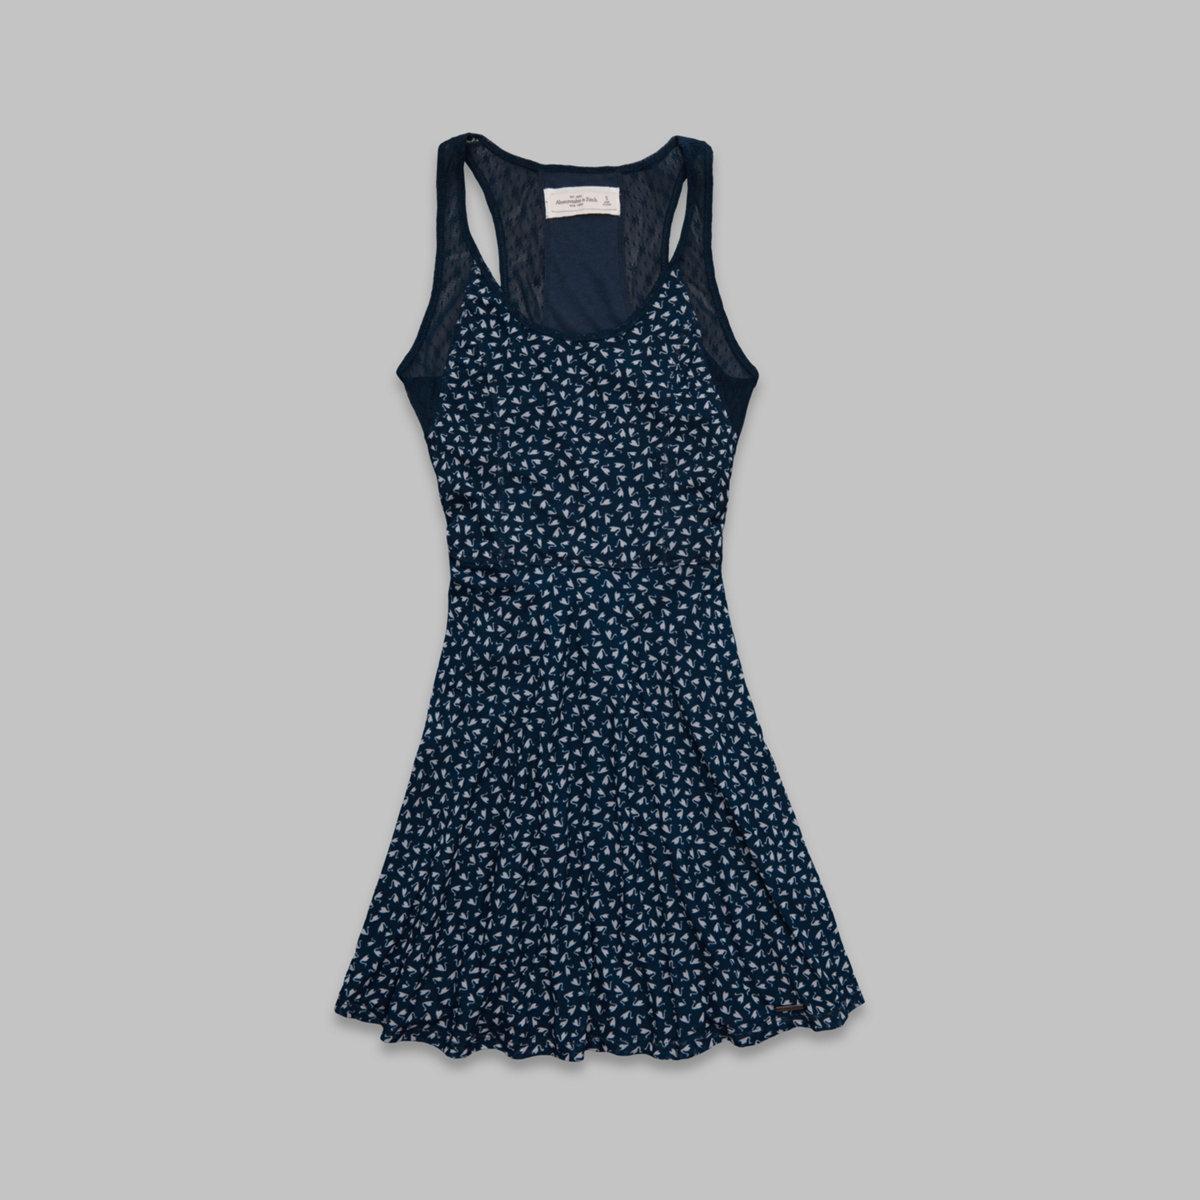 Audrey Skater Dress